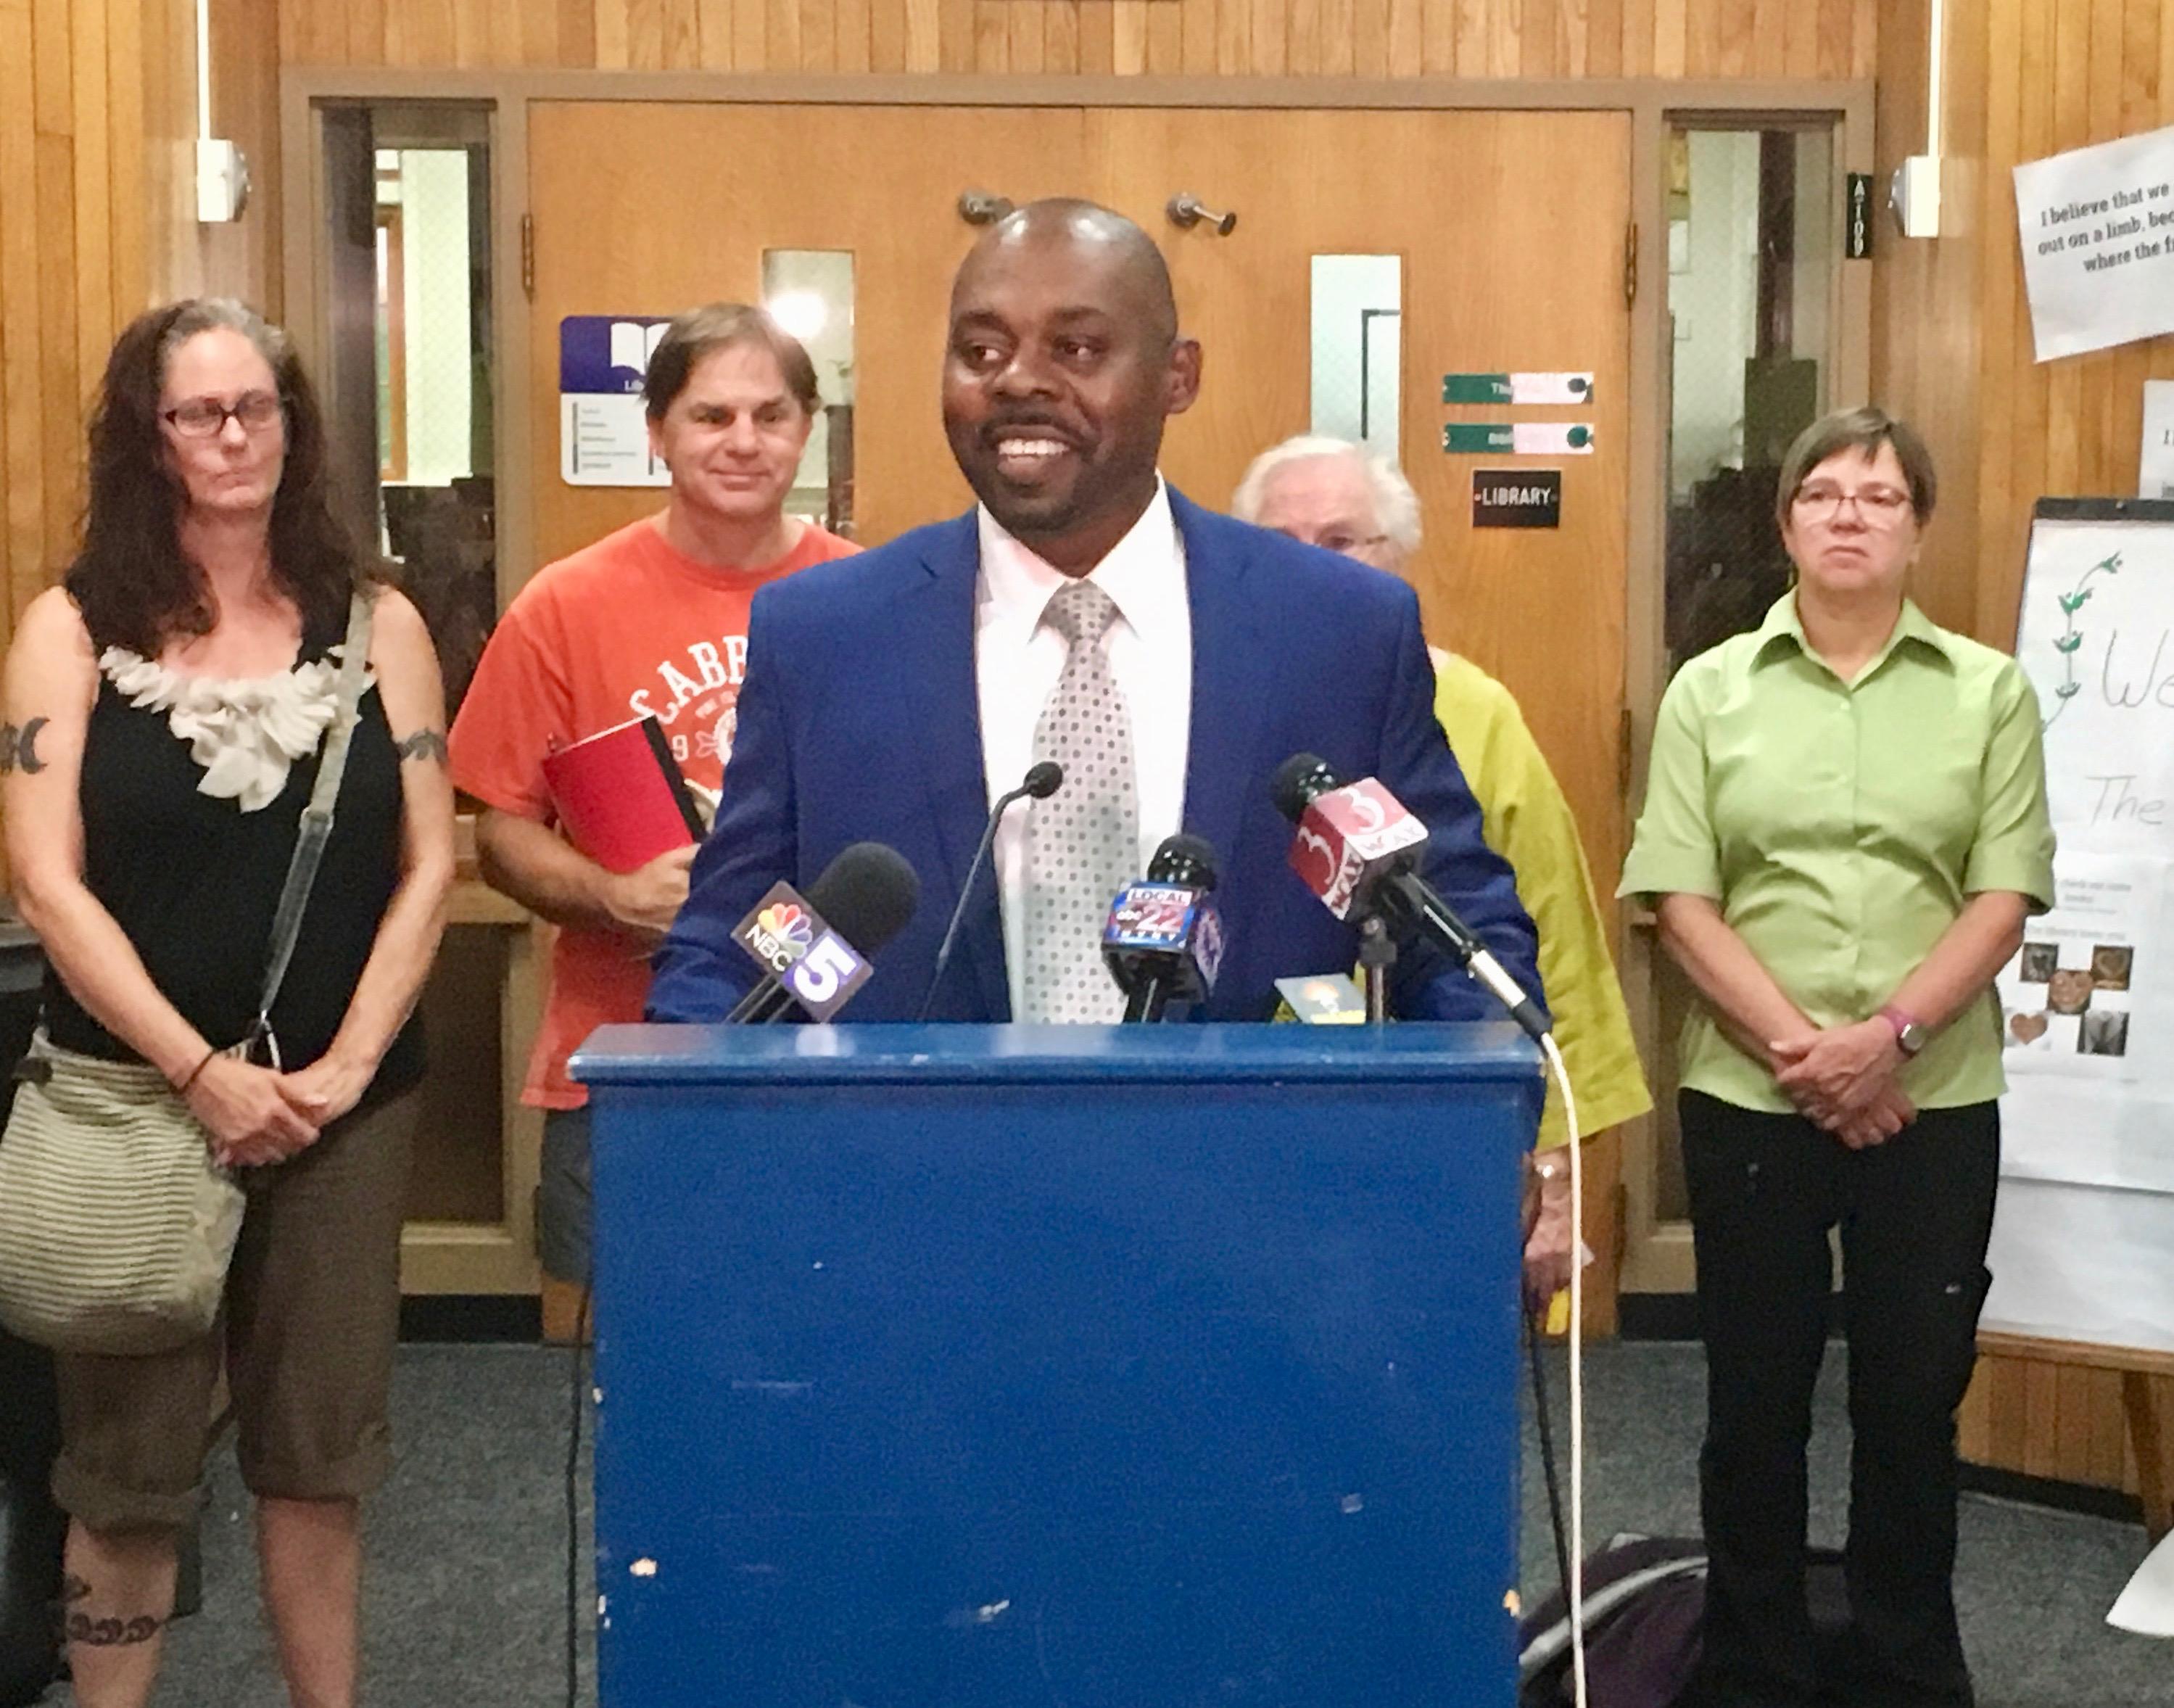 Burlington Teachers And Board Reach Agreement, Strike Ends